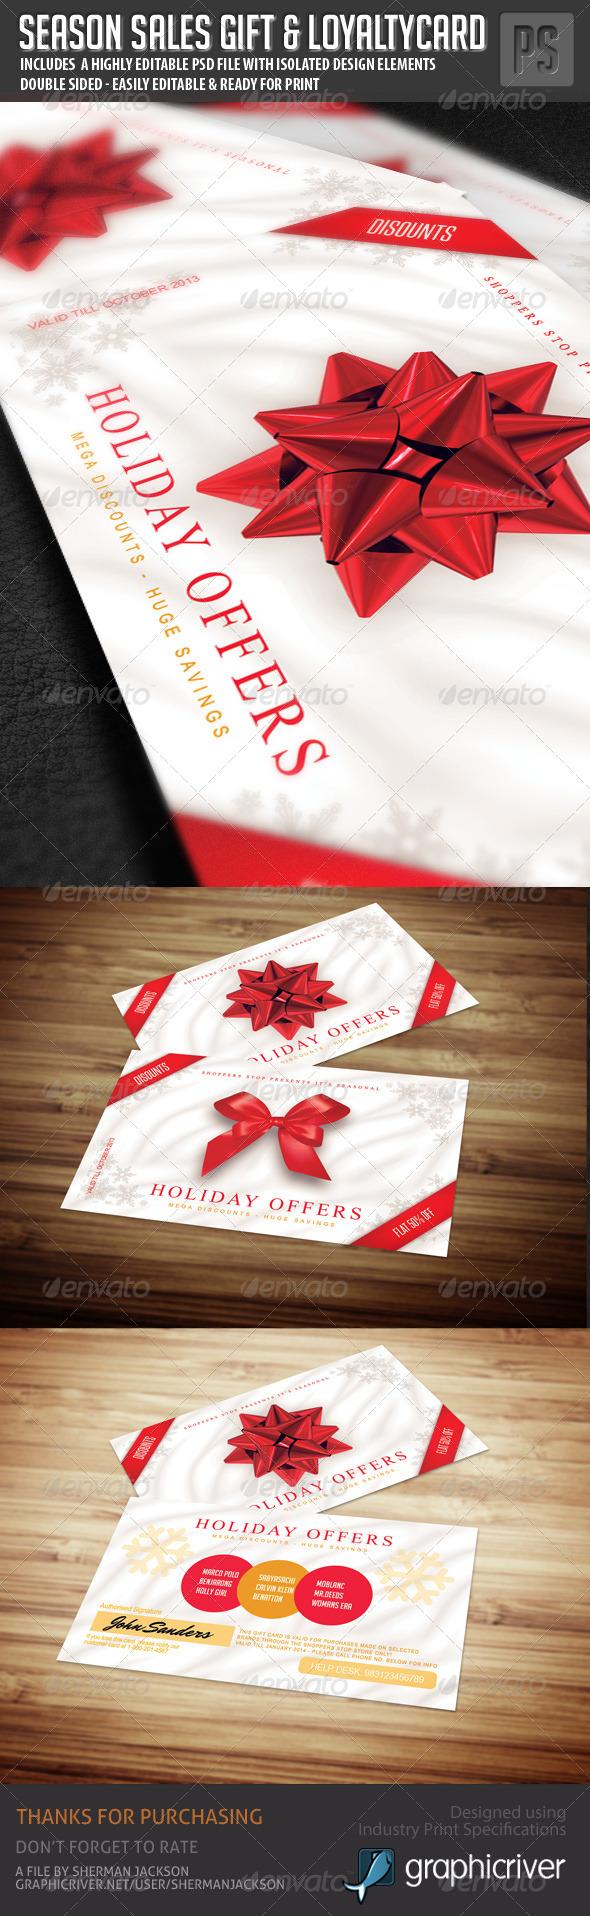 Season Sales Gift Card / Loyalty Card - Loyalty Cards Cards & Invites